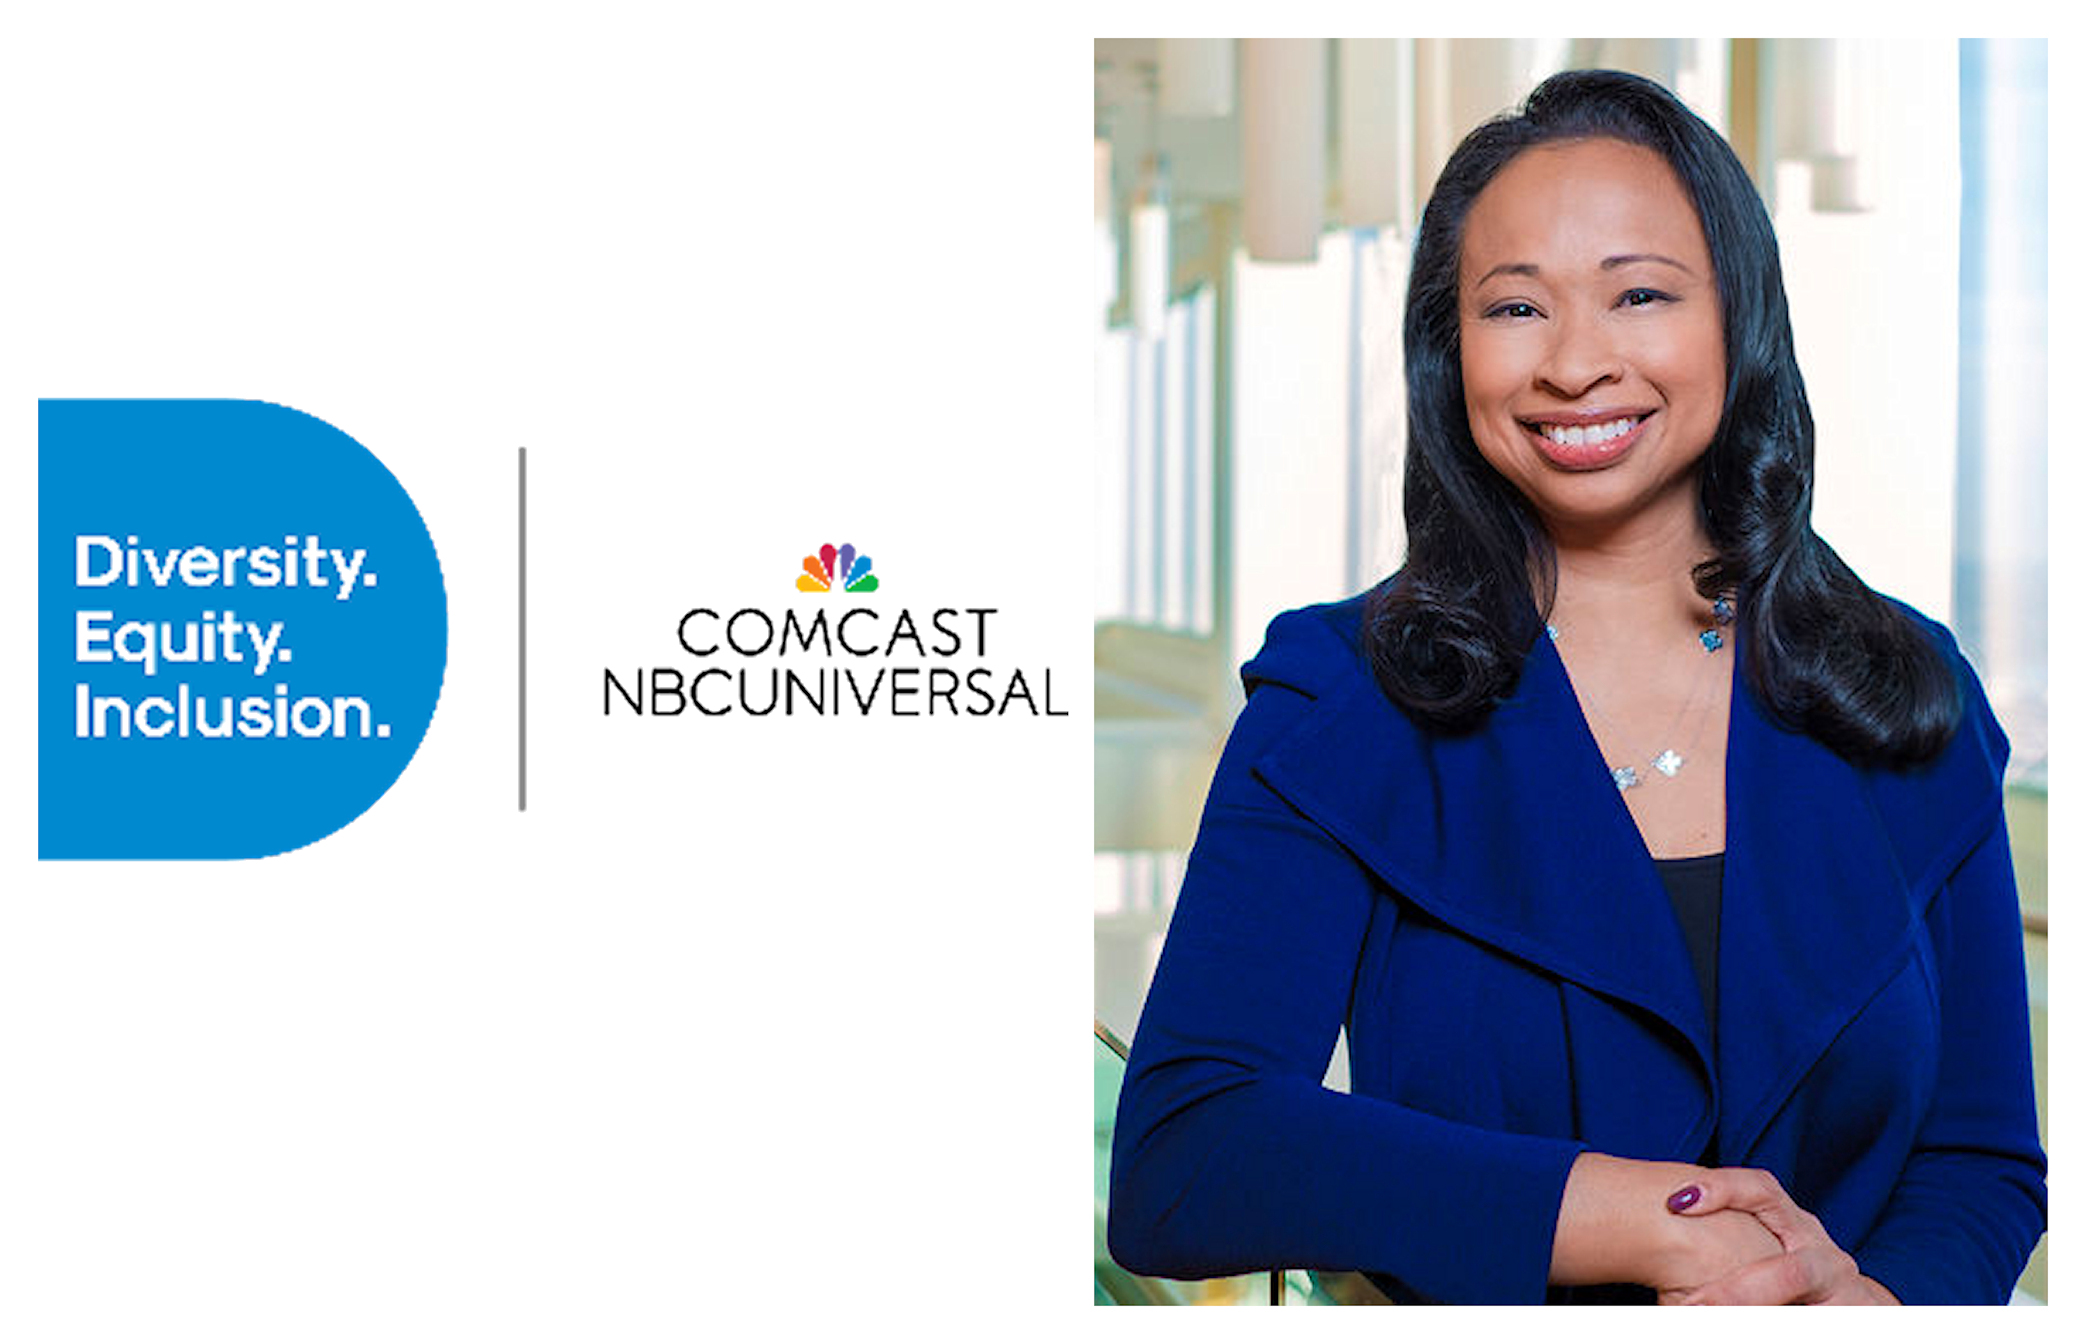 Dalila Wilson-Scott, Executive Vice President and Chief Diversity Officer, Executive Vice President and Chief Diversity Officer of Comcast Corporation and President of the Comcast NBCUniversal Foundation